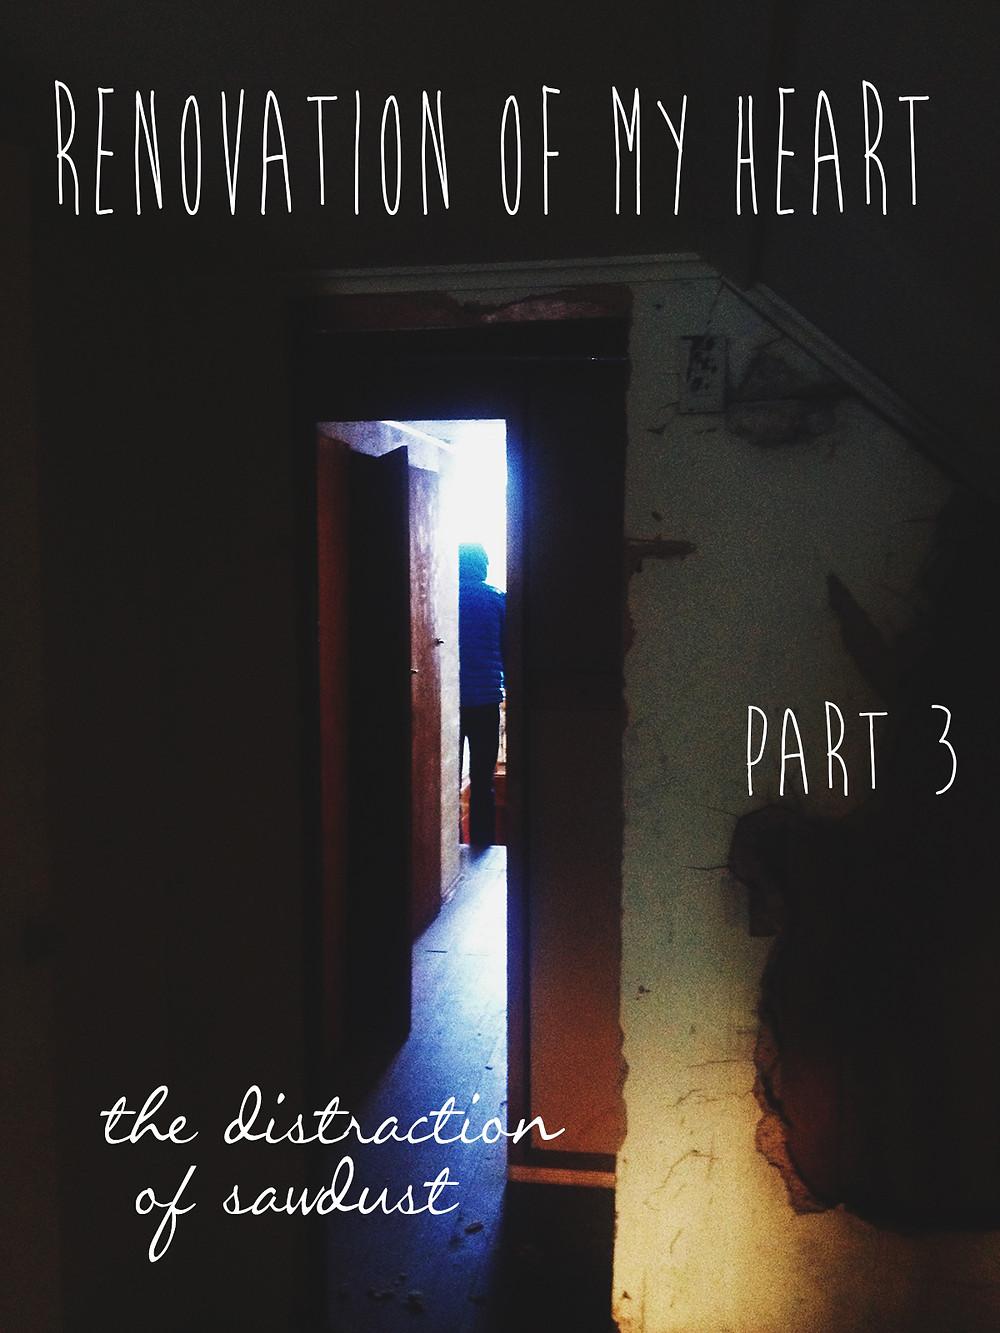 Renovationofmyheart3.jpg